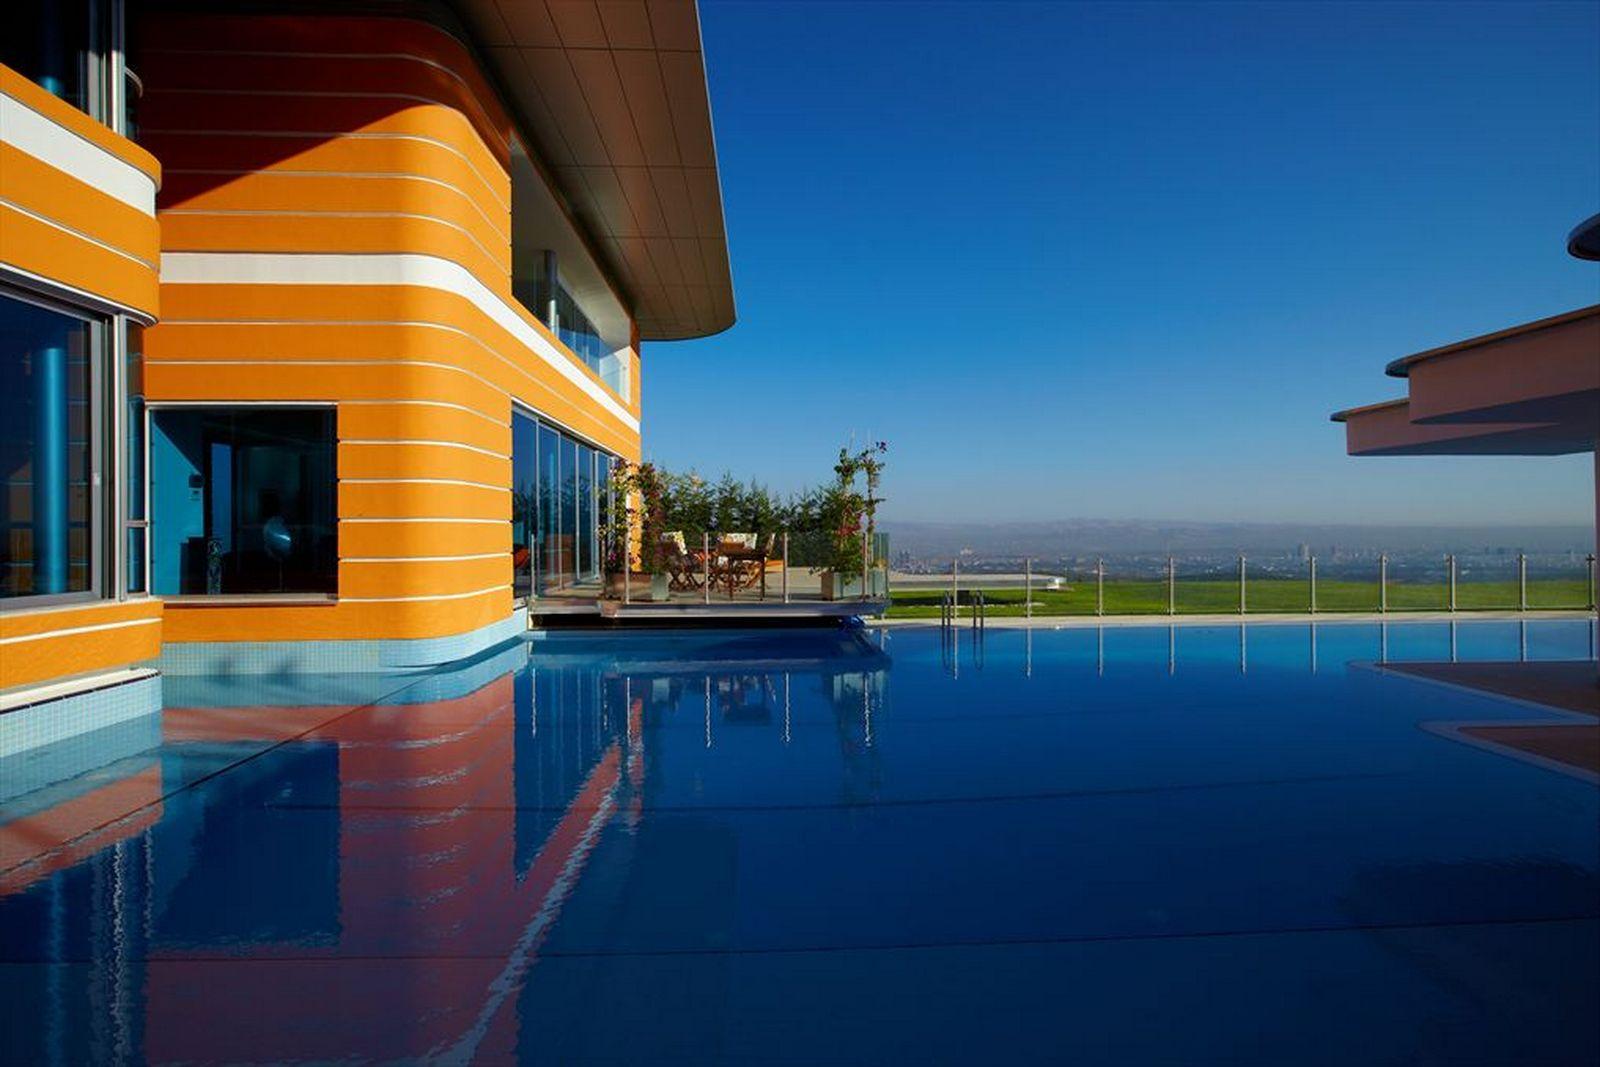 Colorful-House-Ideas-Yazgan-Design-Architecture-swimming-pool-design-5